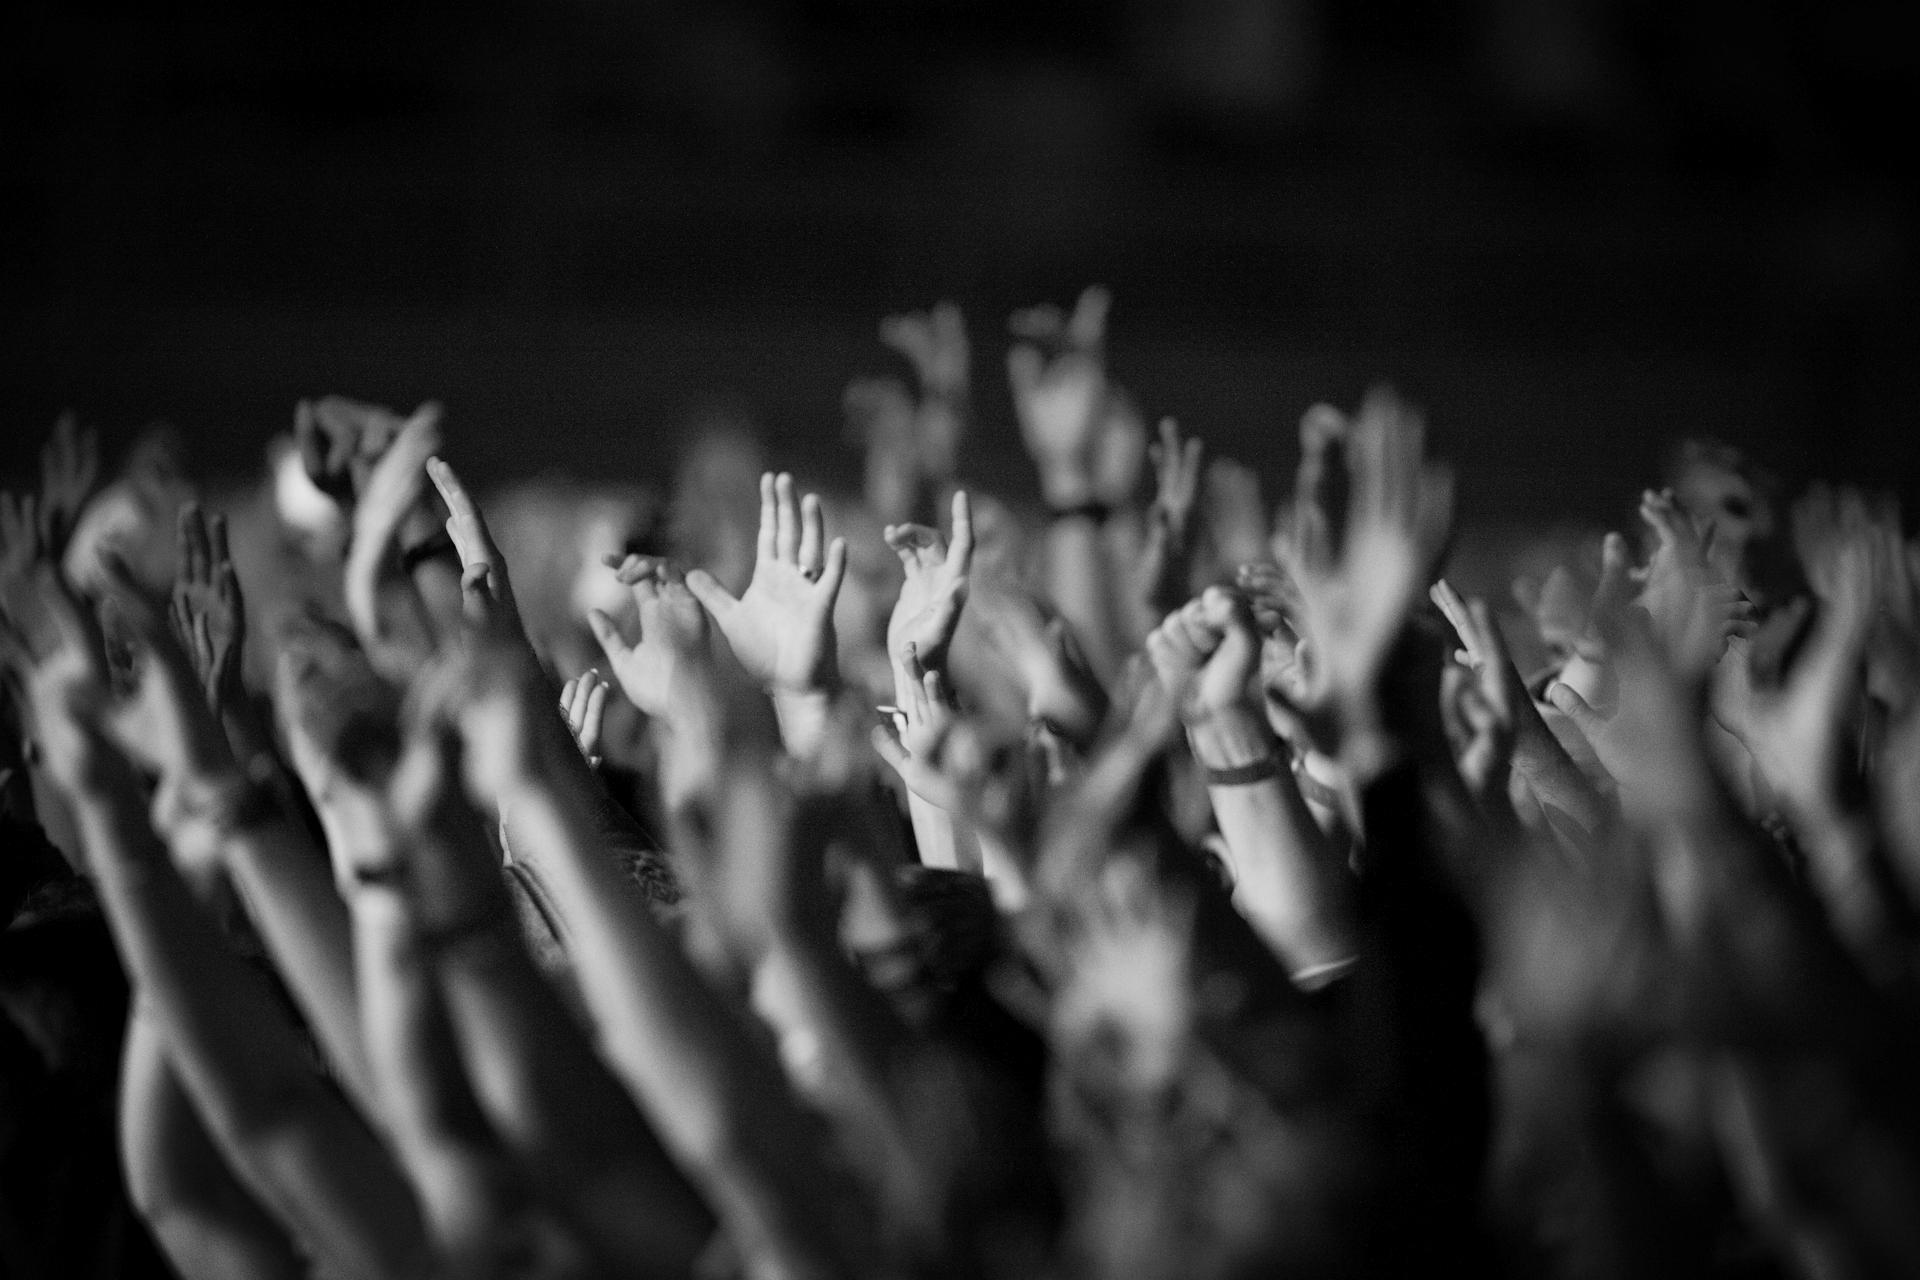 worship_hands.jpg